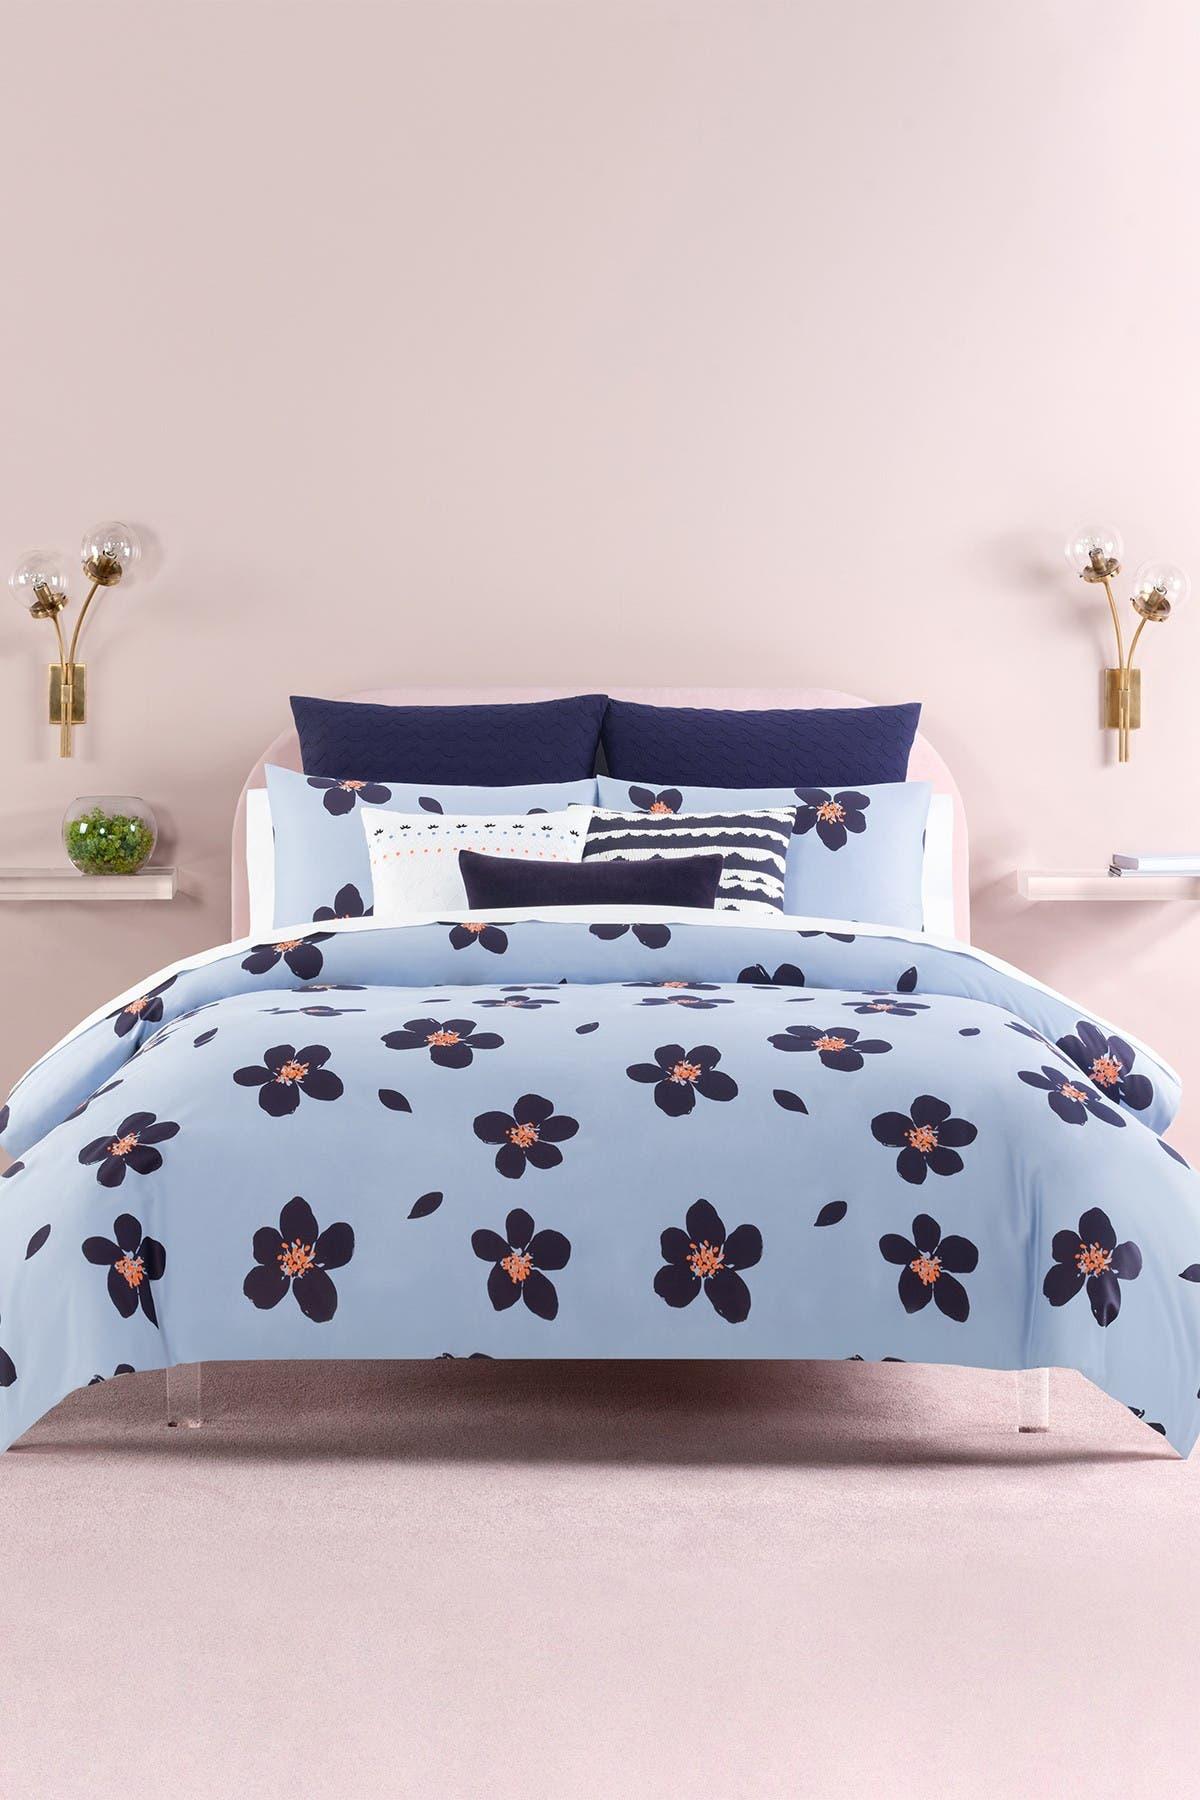 Image of kate spade new york blue grand floral king comforter 3-piece set